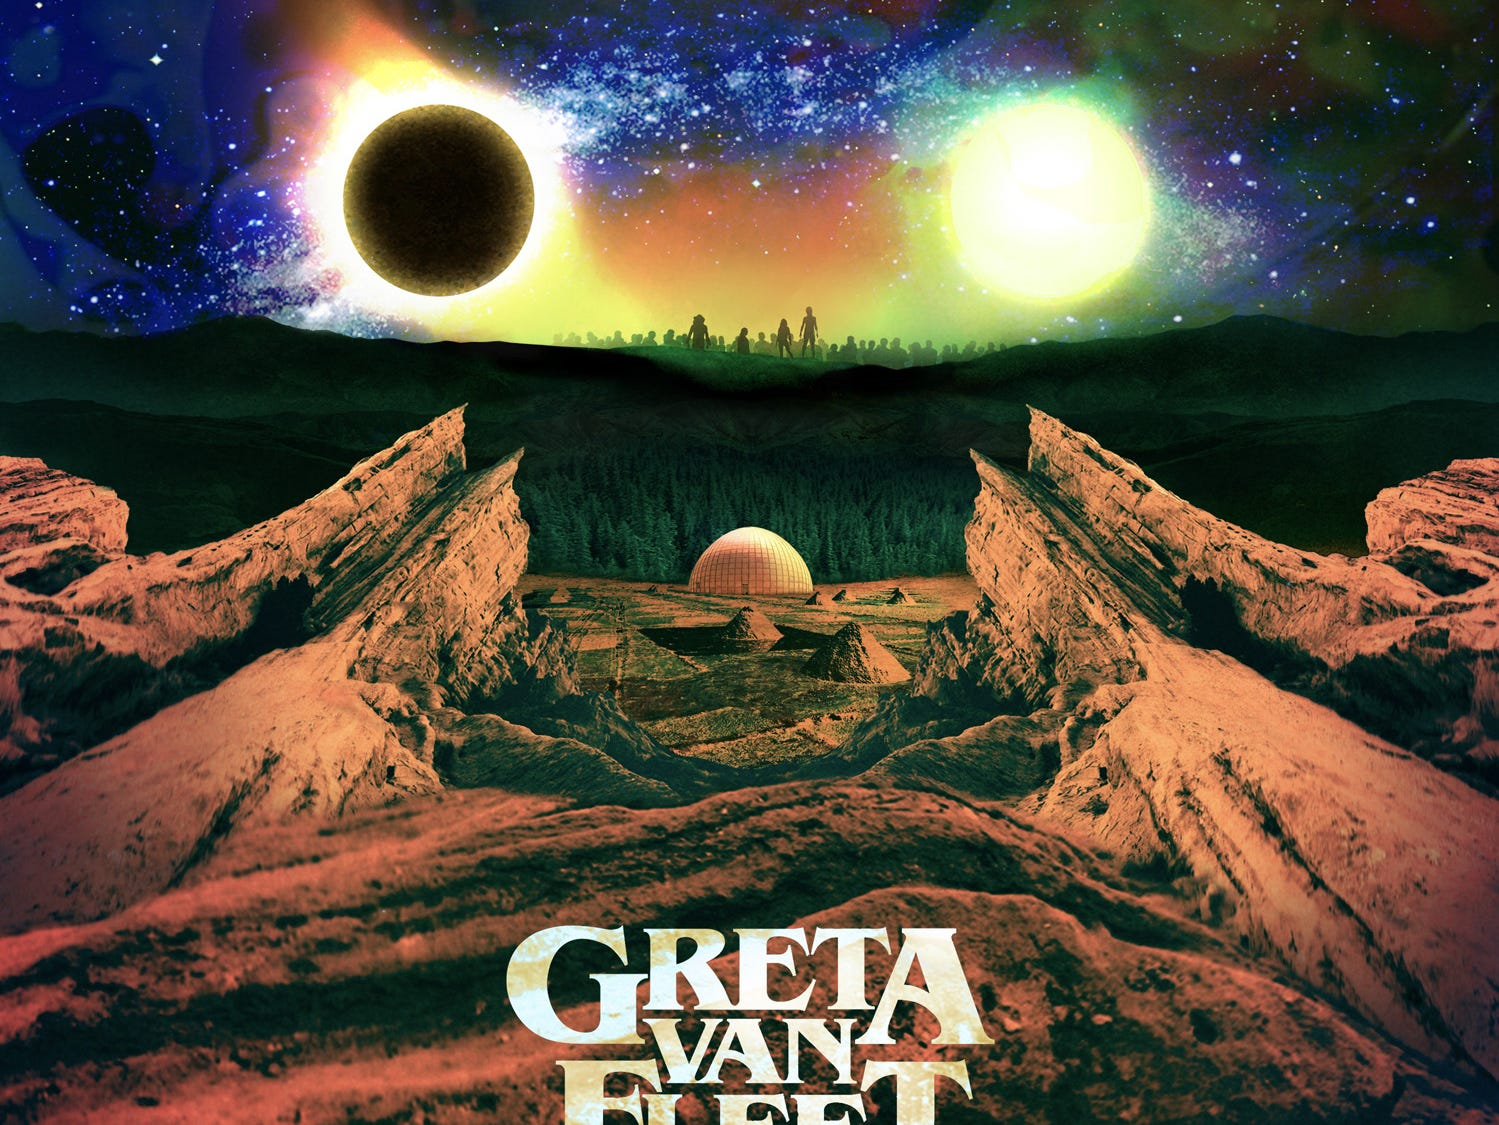 Local CD pick: Anthem of the Peaceful Army by Greta Van Fleet